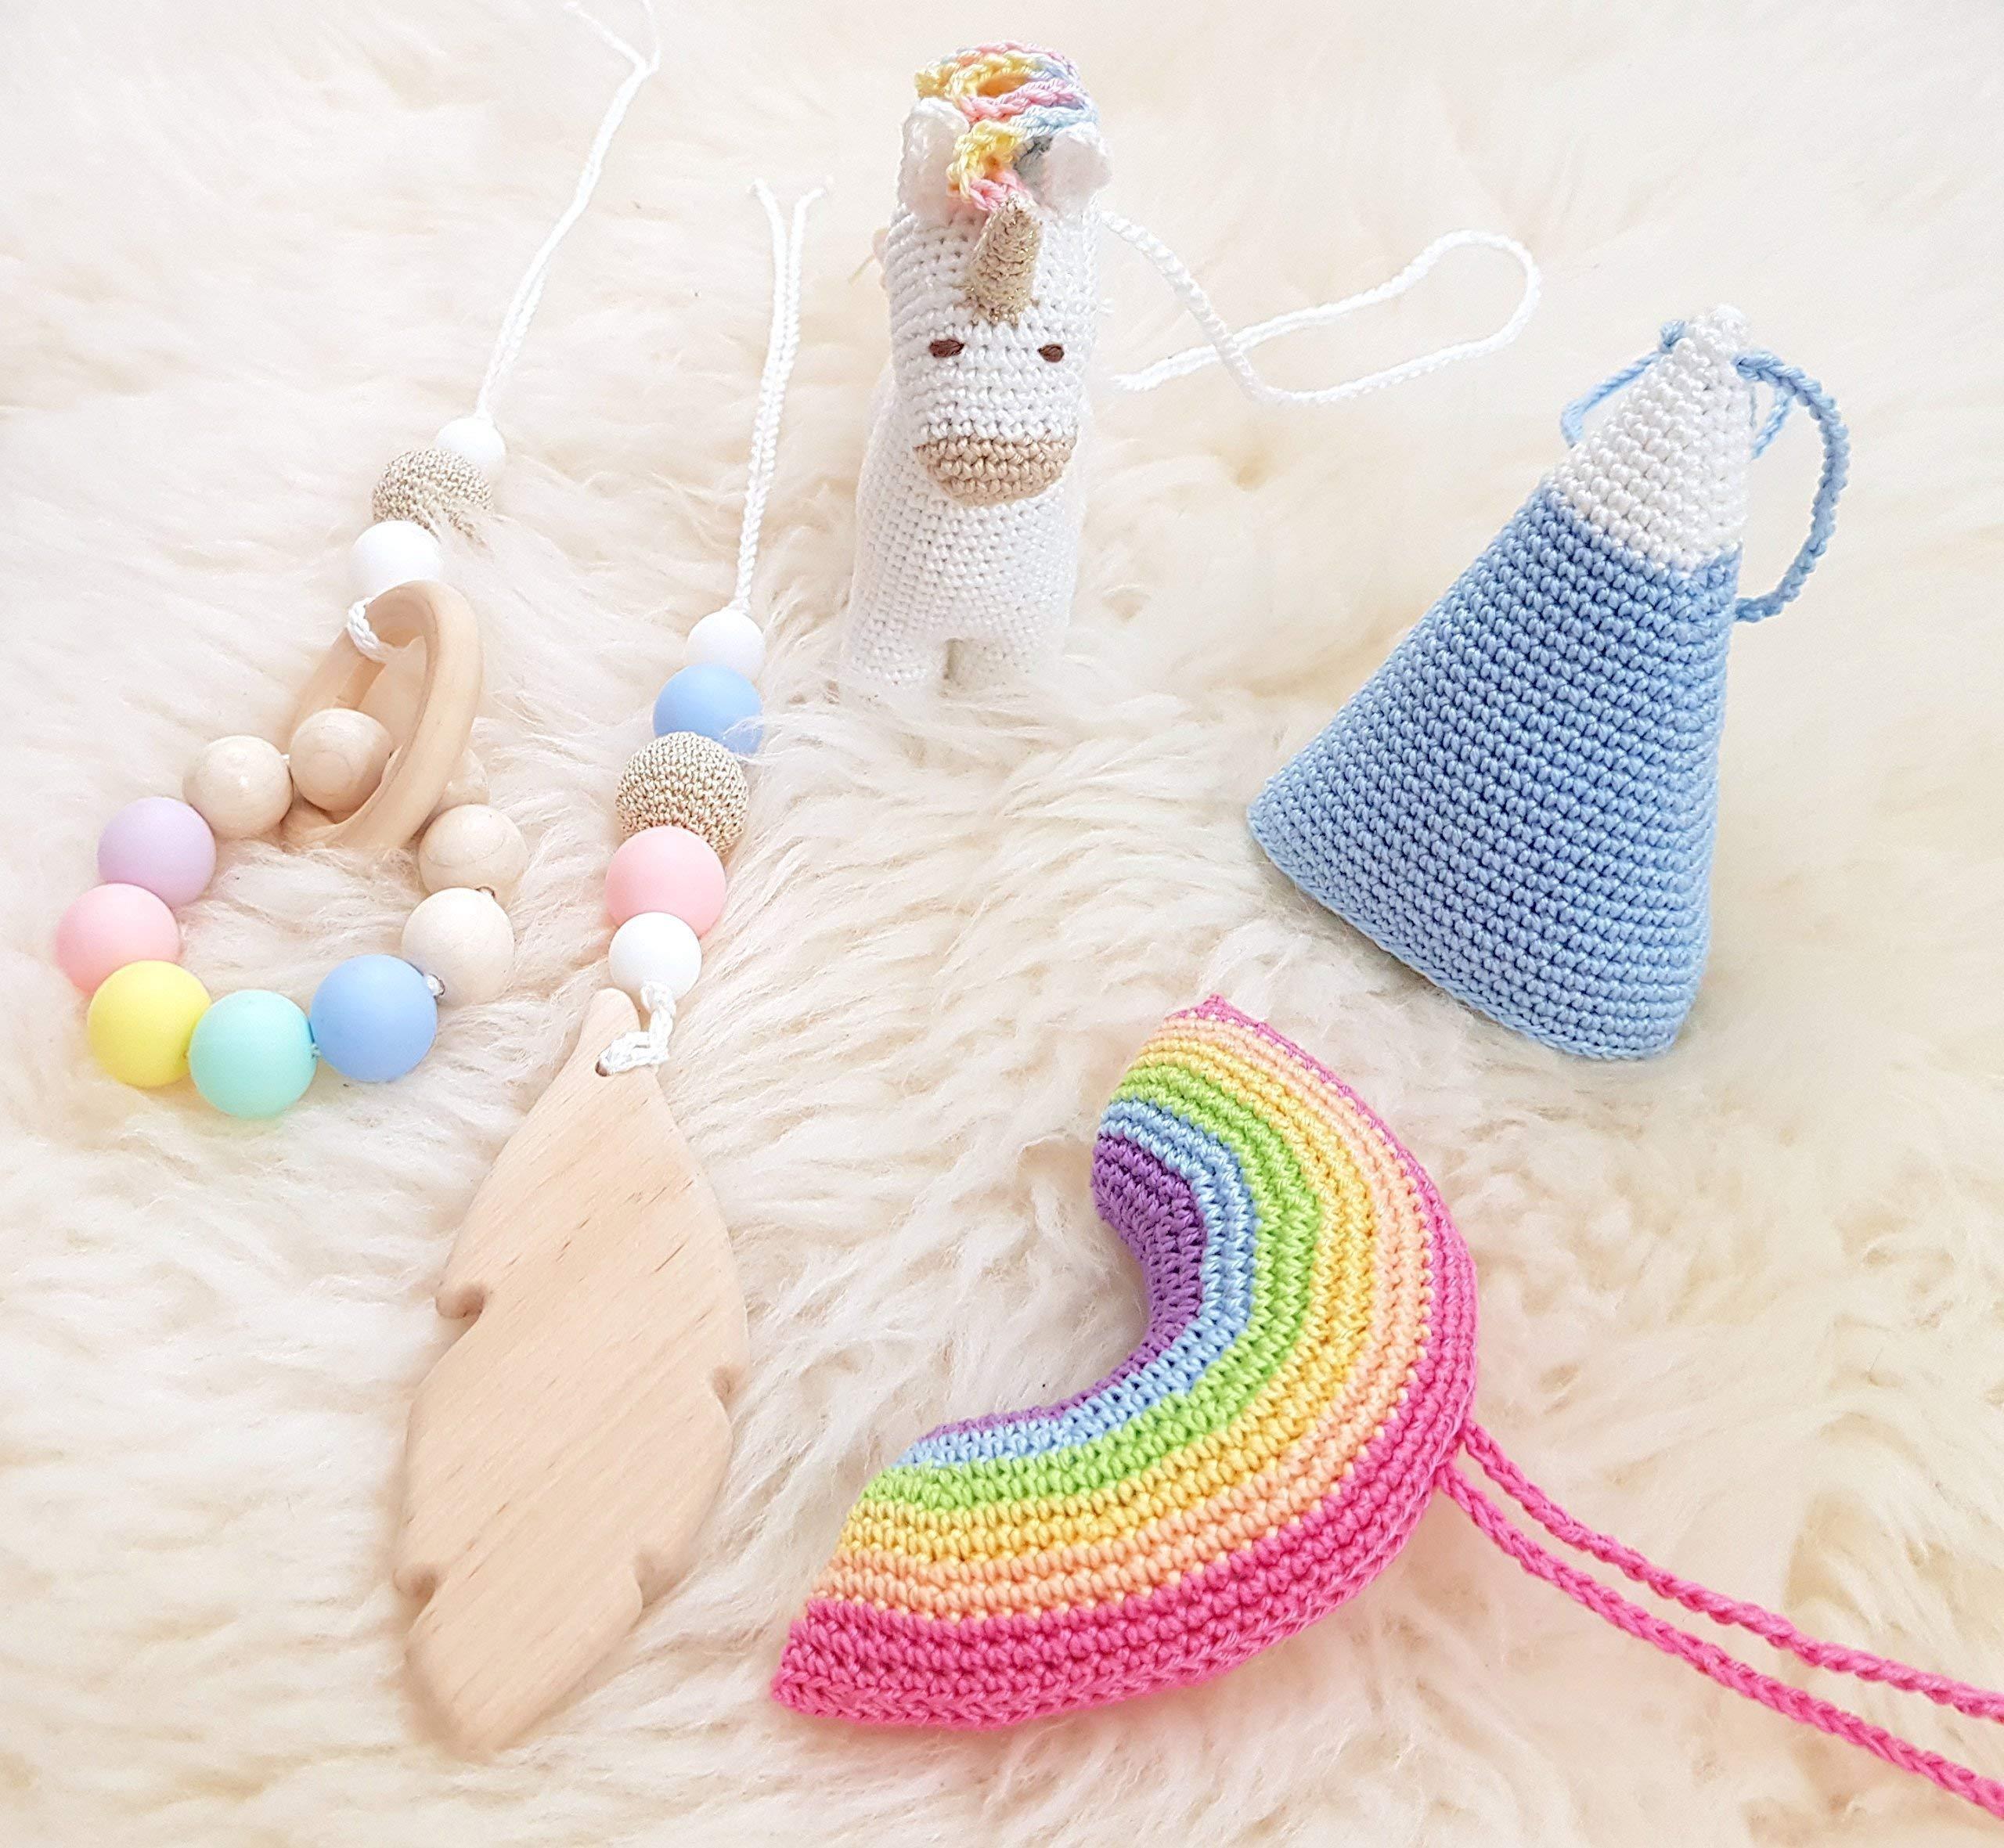 Rainbow Unicorn Baby Play Gym with 5 Mobiles: Unicorn, Rainbow, Mountain, Feather, Beaded Ring. Handmade by… 9